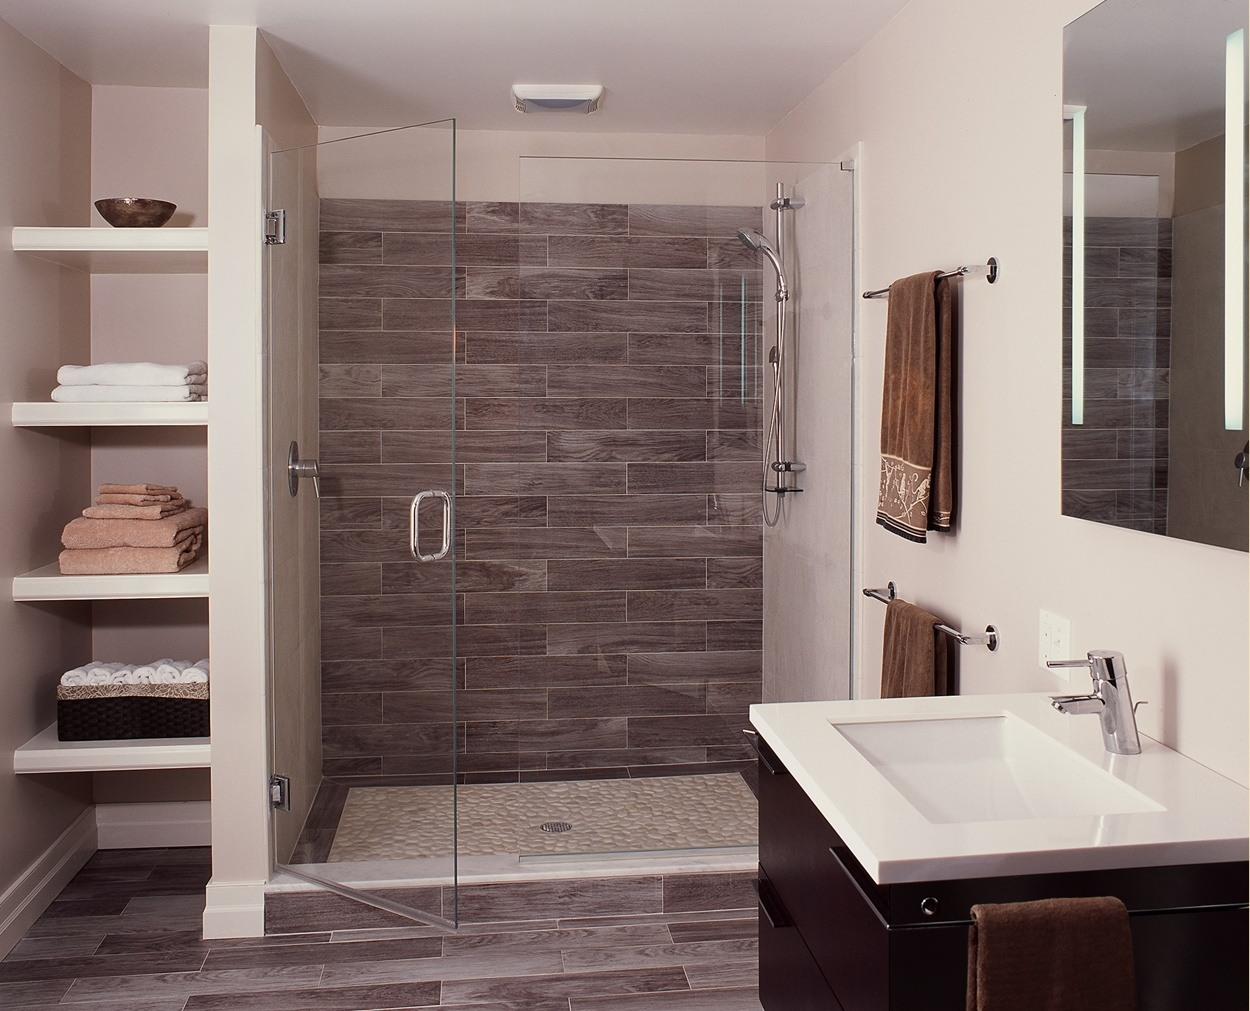 Modern bath with free standing vanity in a dark wood.